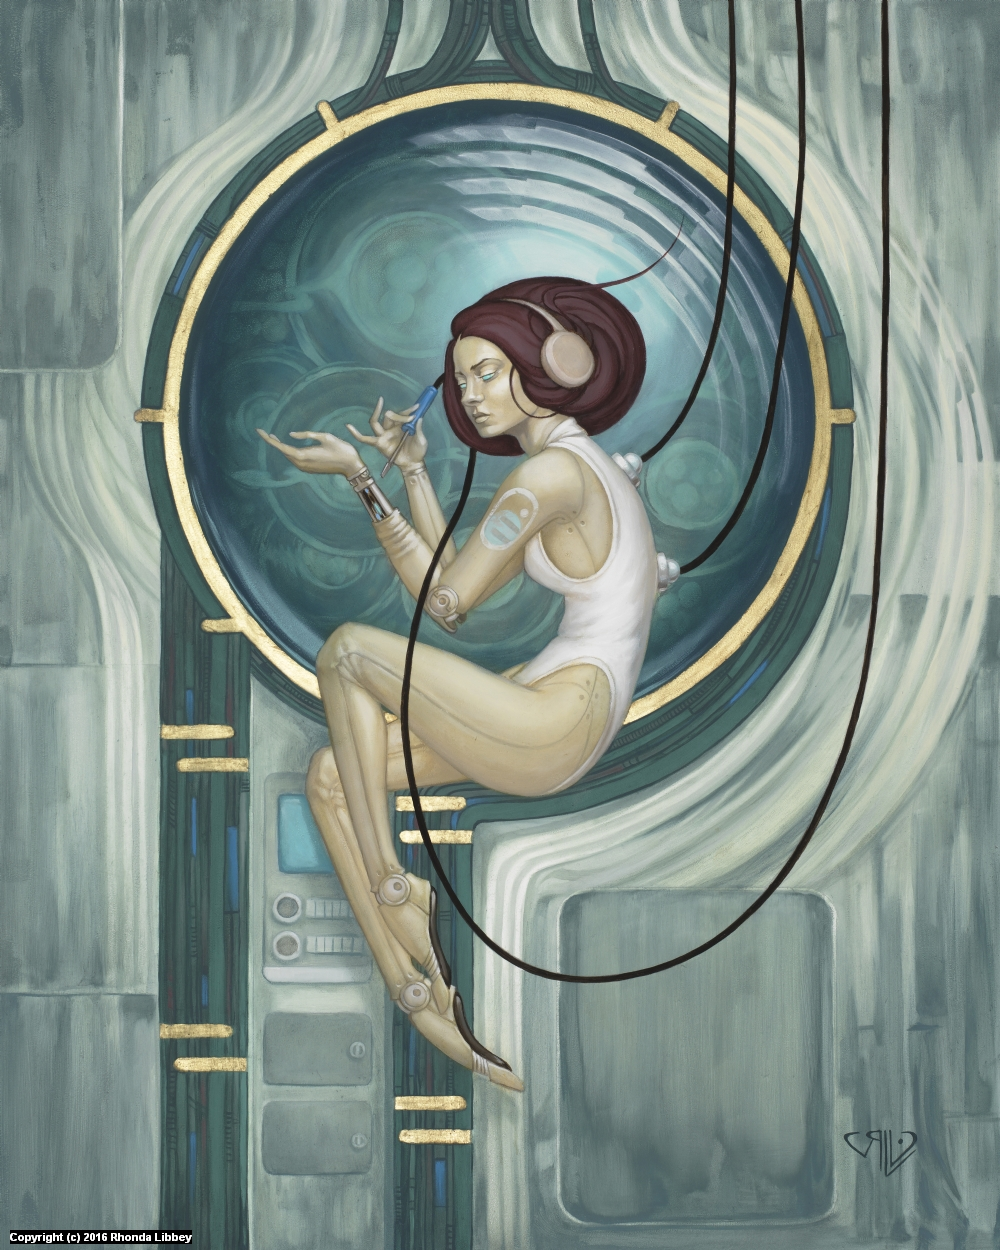 Solitude Artwork by Rhonda Libbey